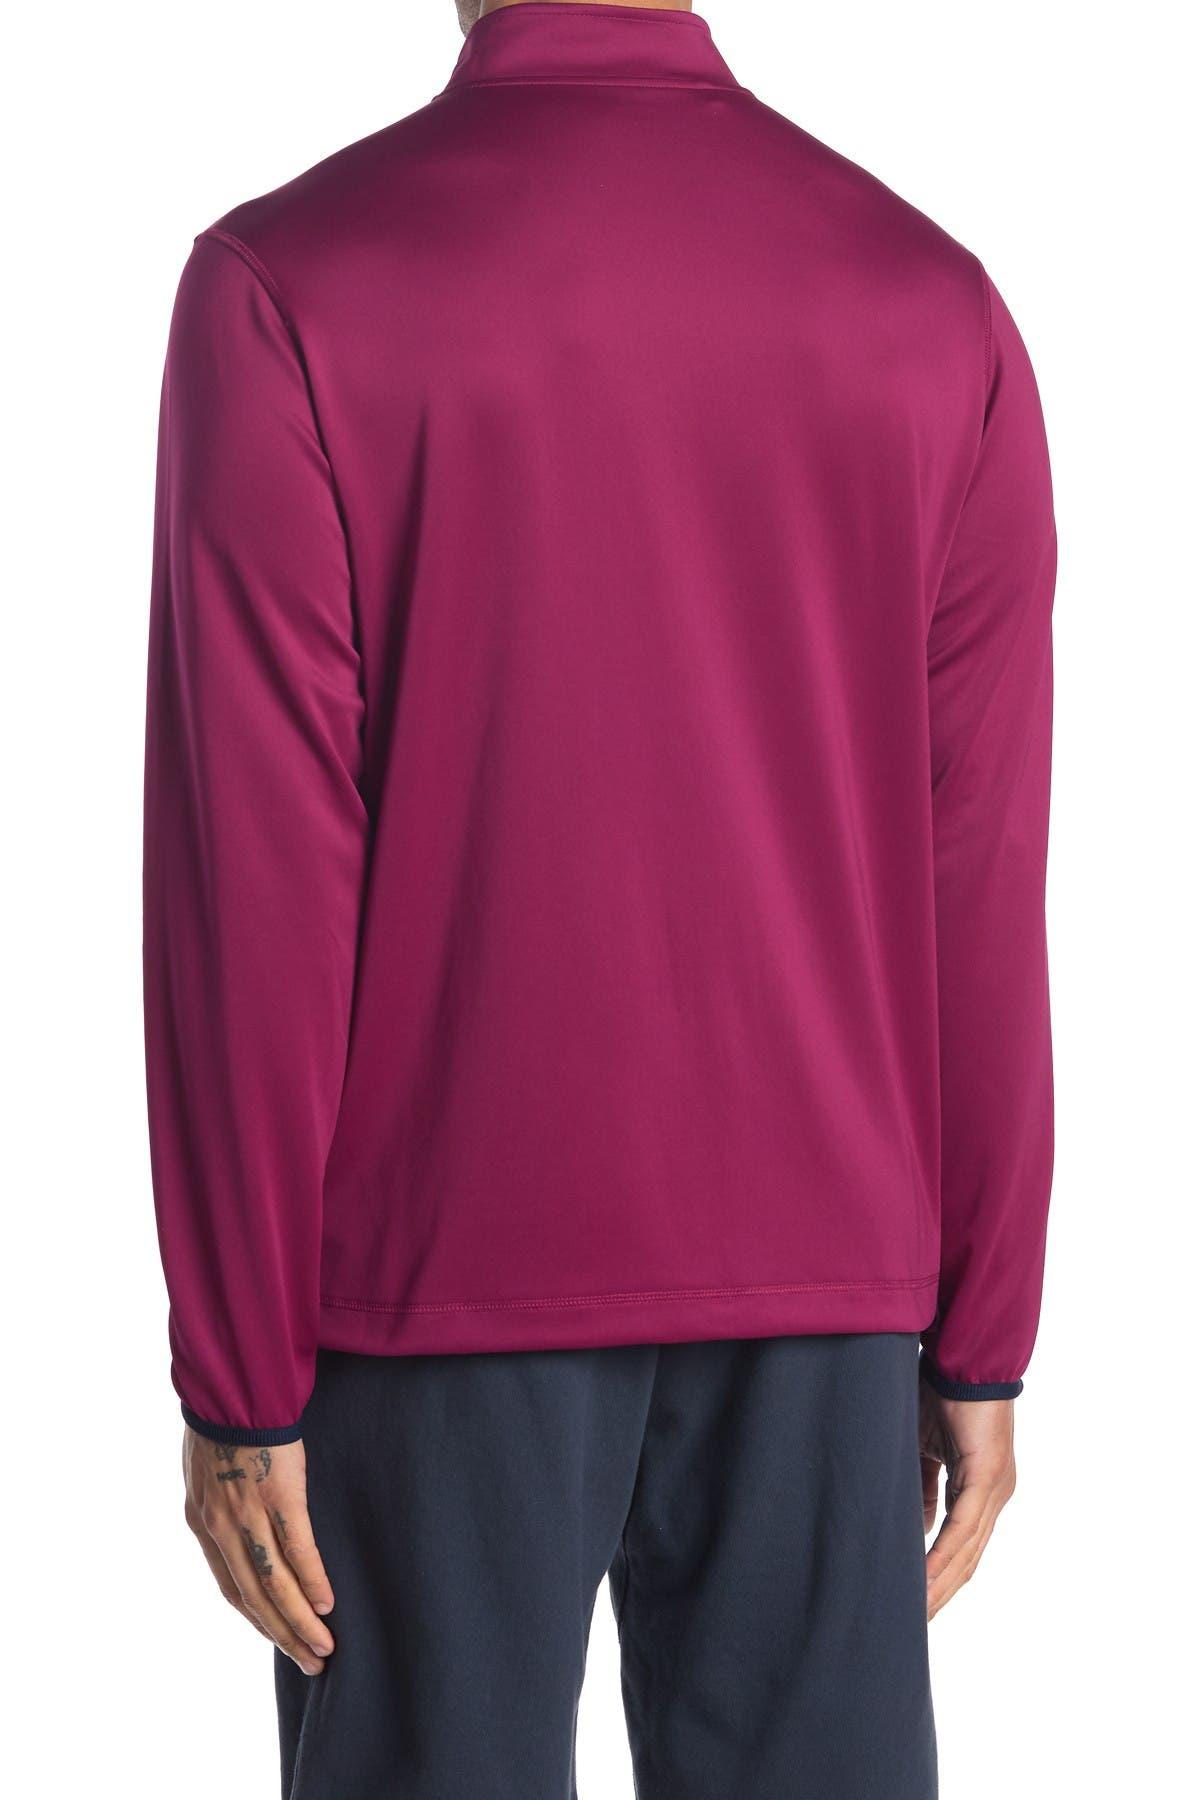 Image of Adidas Golf 3 Stripes Midweight Layering Sweatshirt